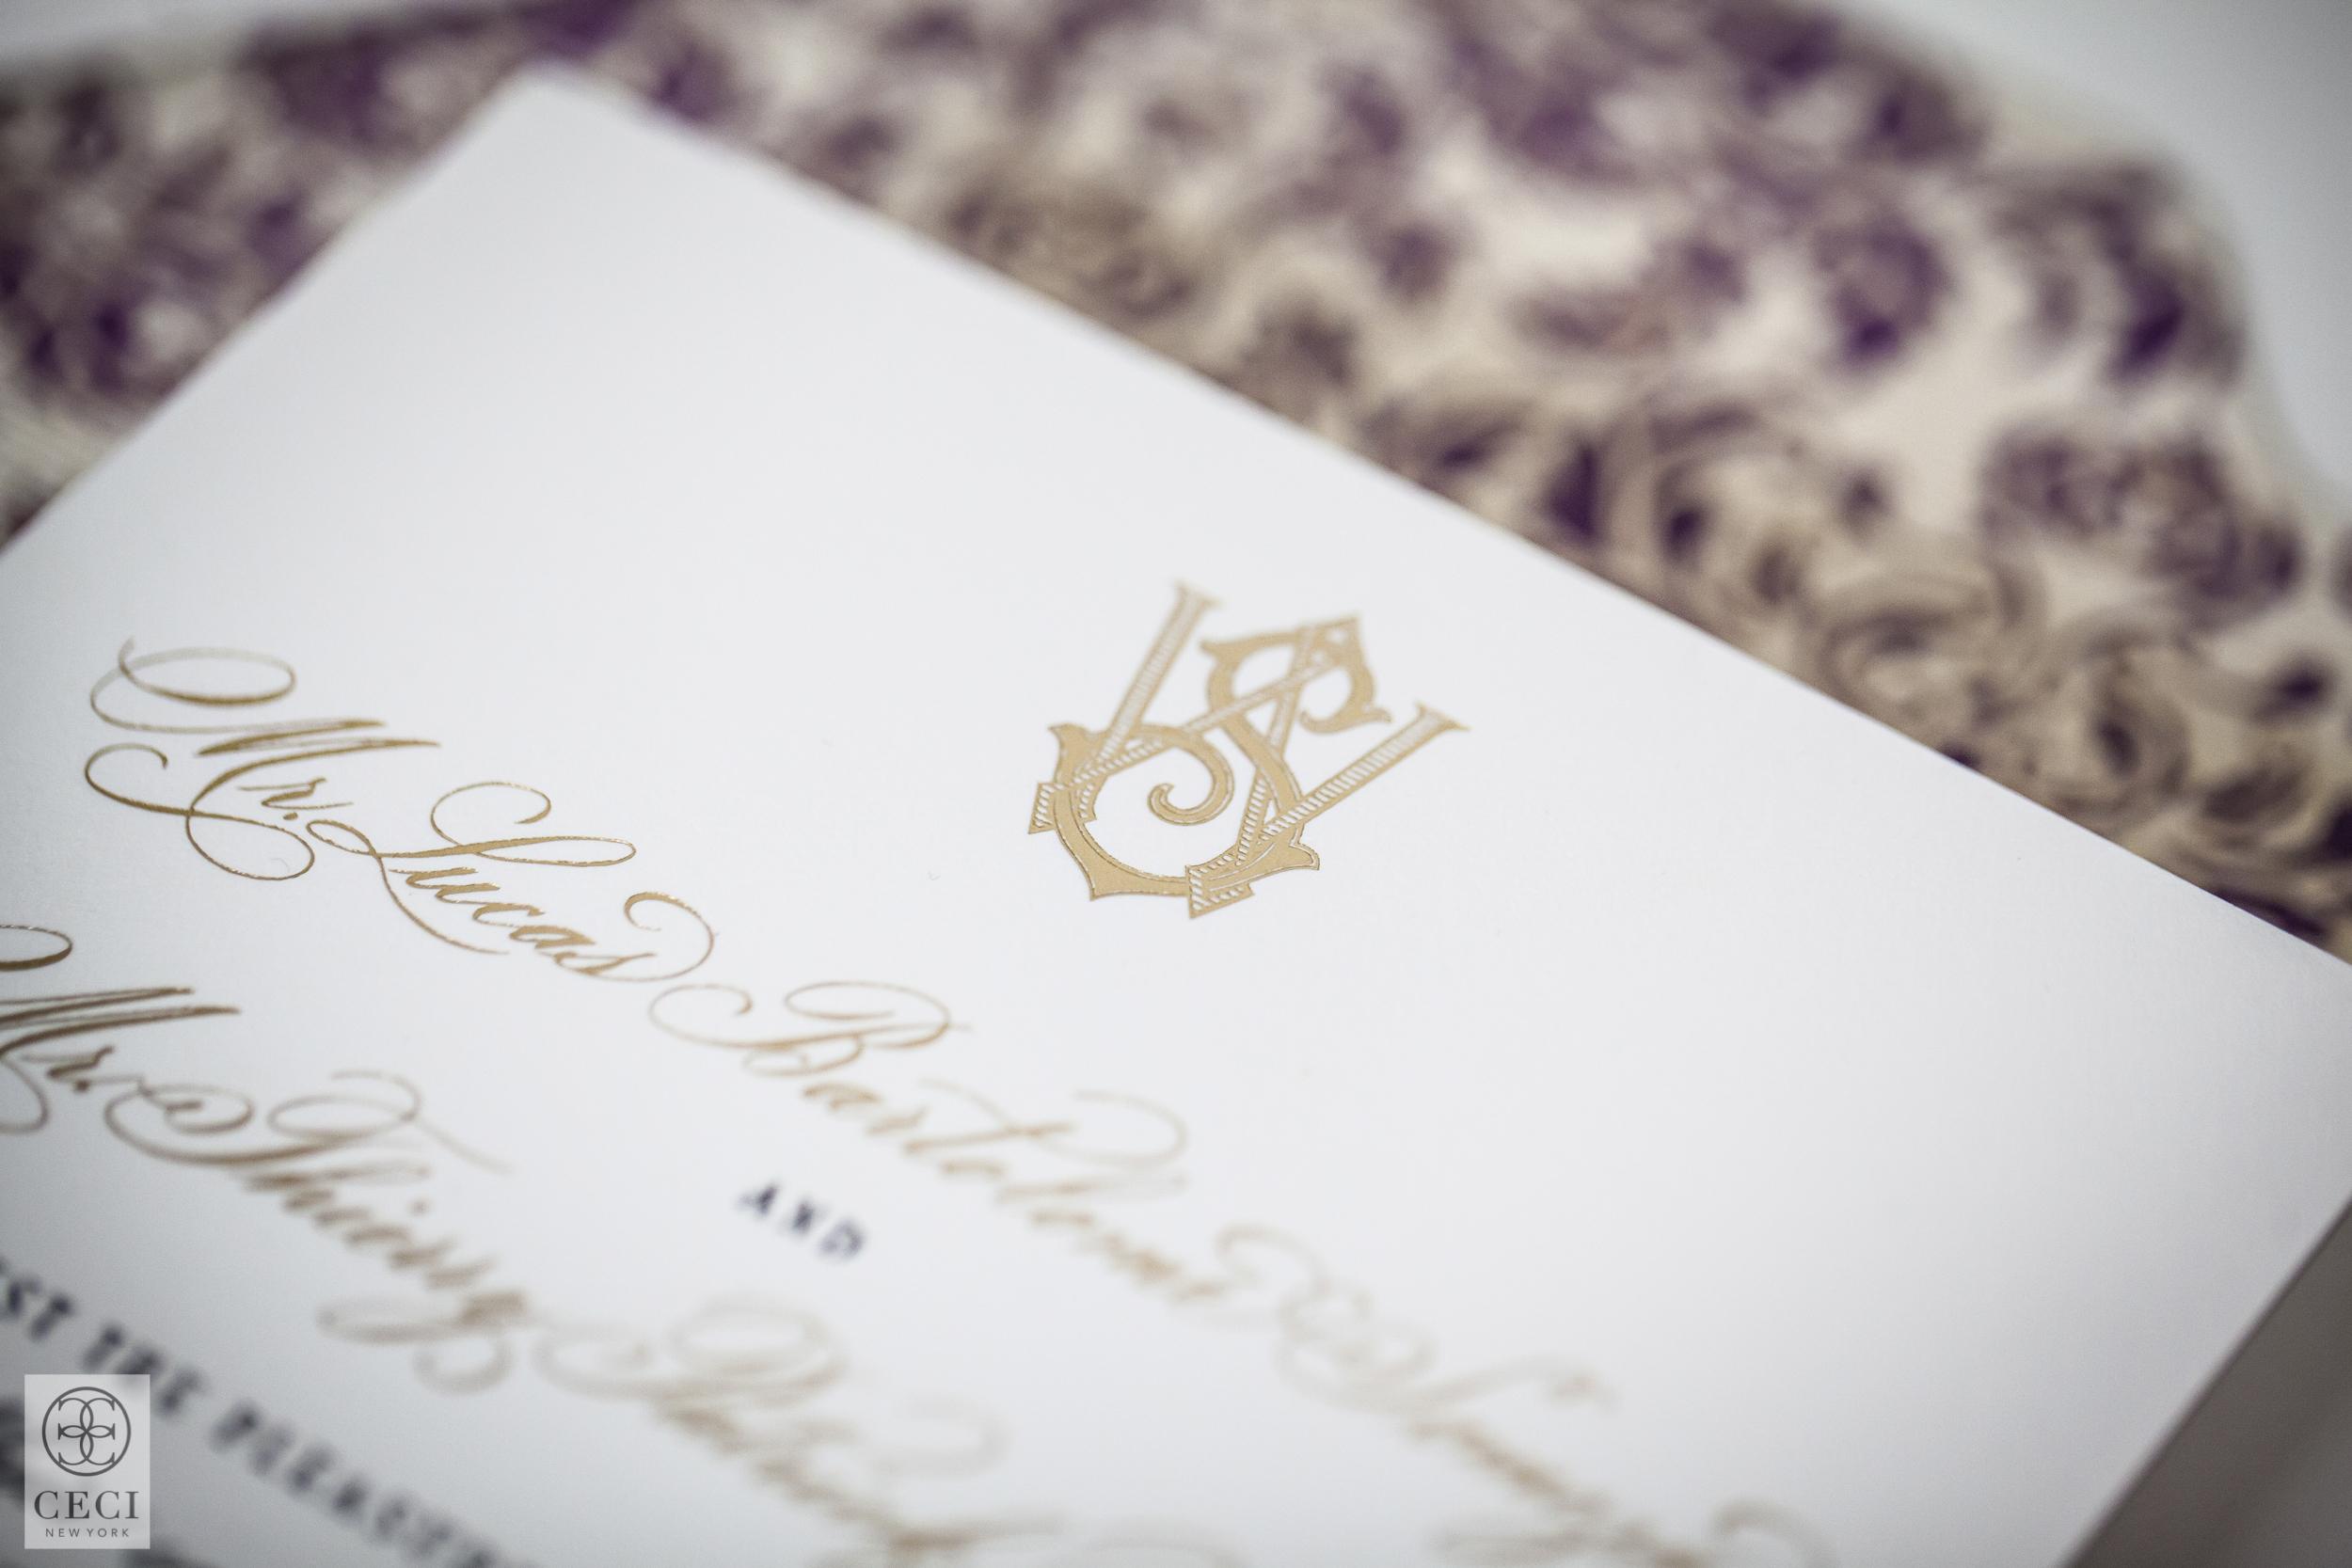 ceci_new_york_lucas_somoza_purple_regal_wediding_birthday_commitment_ceremony_gold-4.jpg